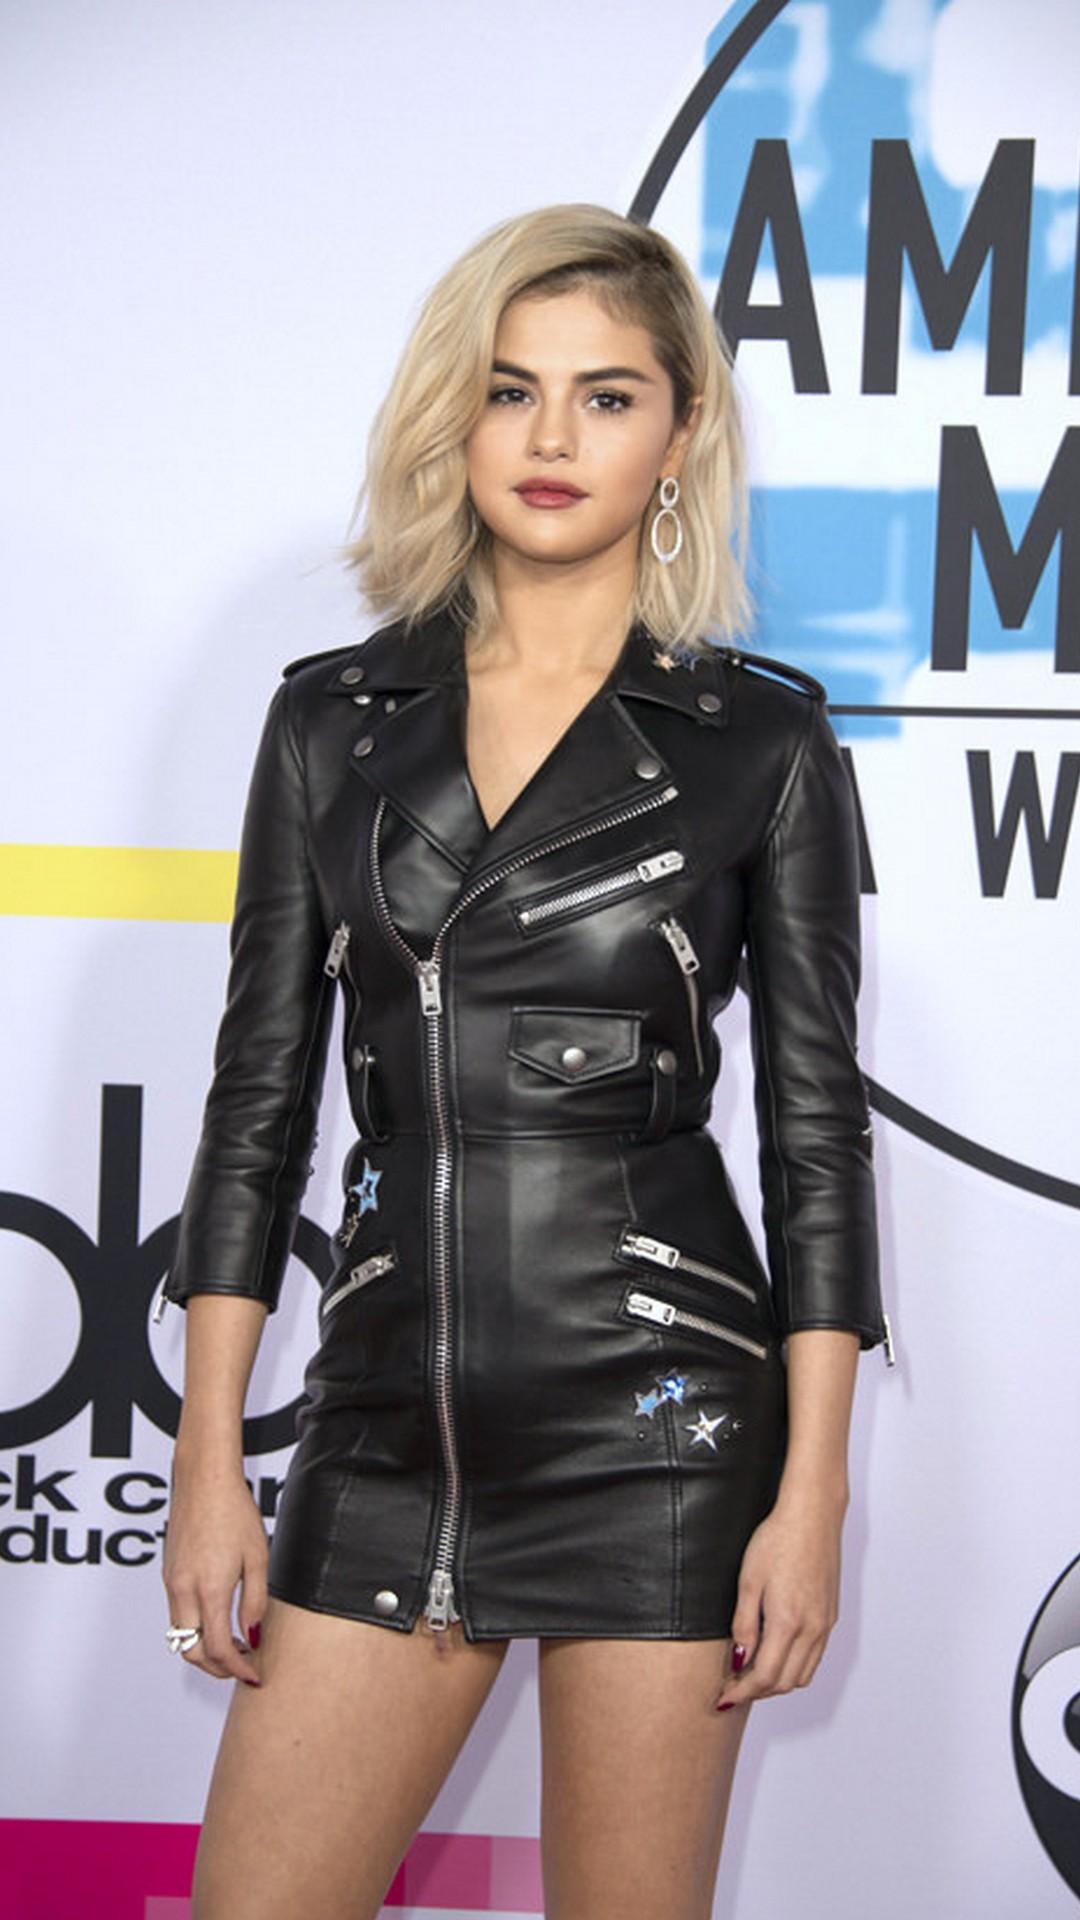 iPhone Wallpaper Selena Gomez Blonde Hair 2020 3D iPhone Wallpaper 1080x1920